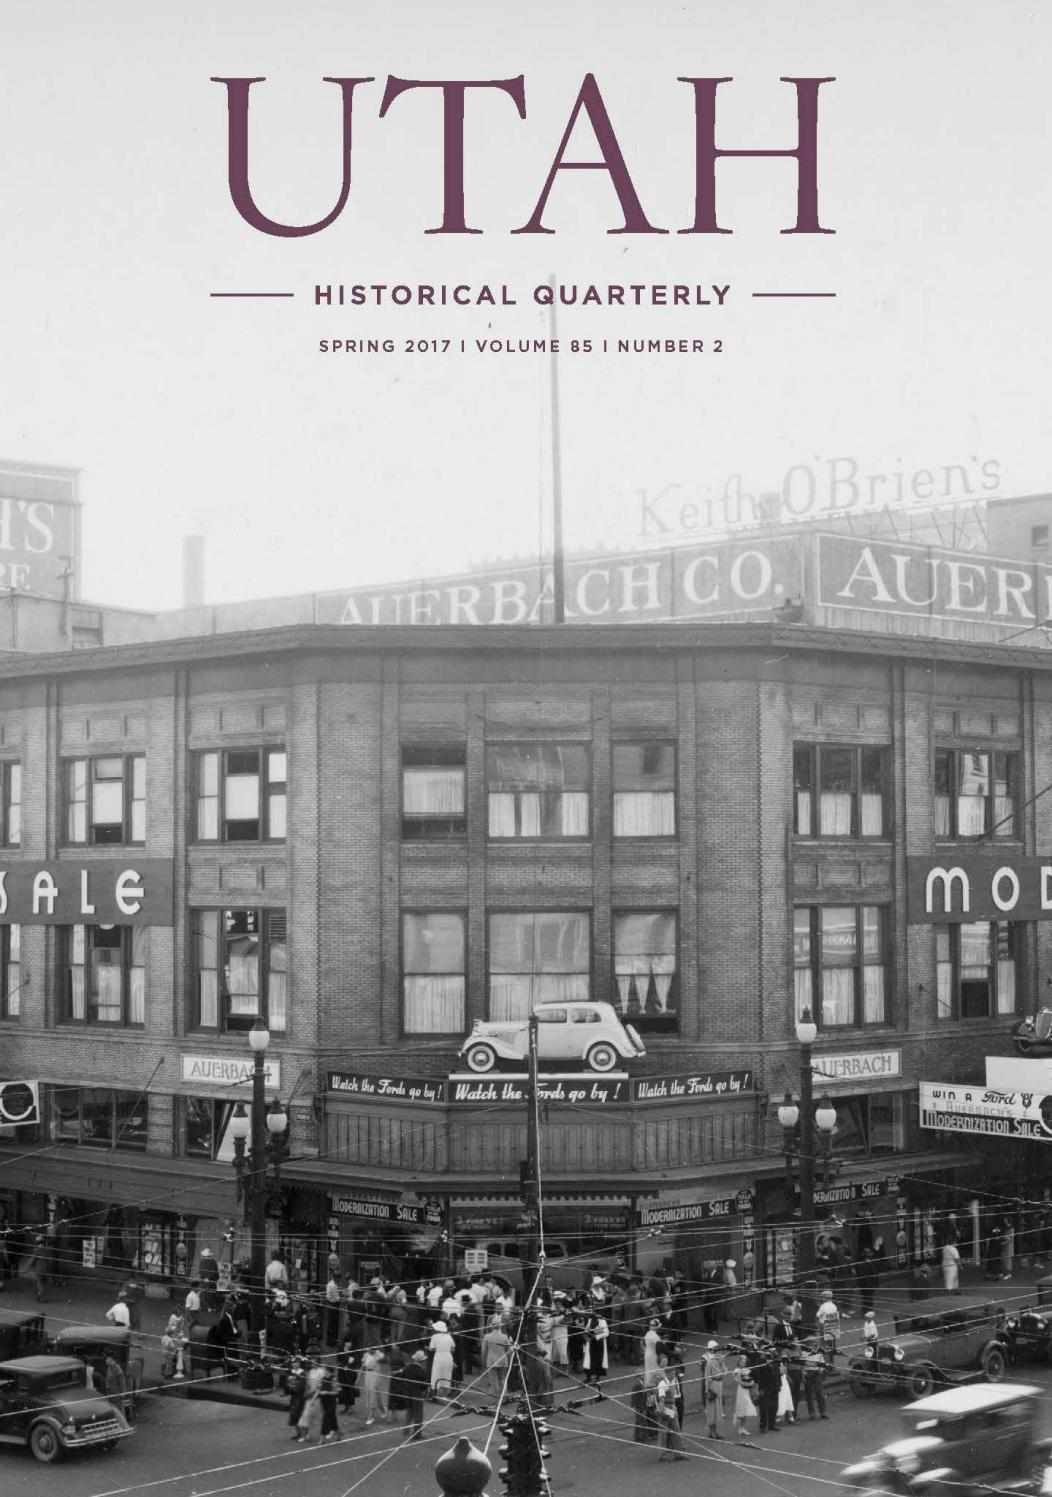 Utah Historical Quarterly, Volume 85, Number 2, 2017 by Utah